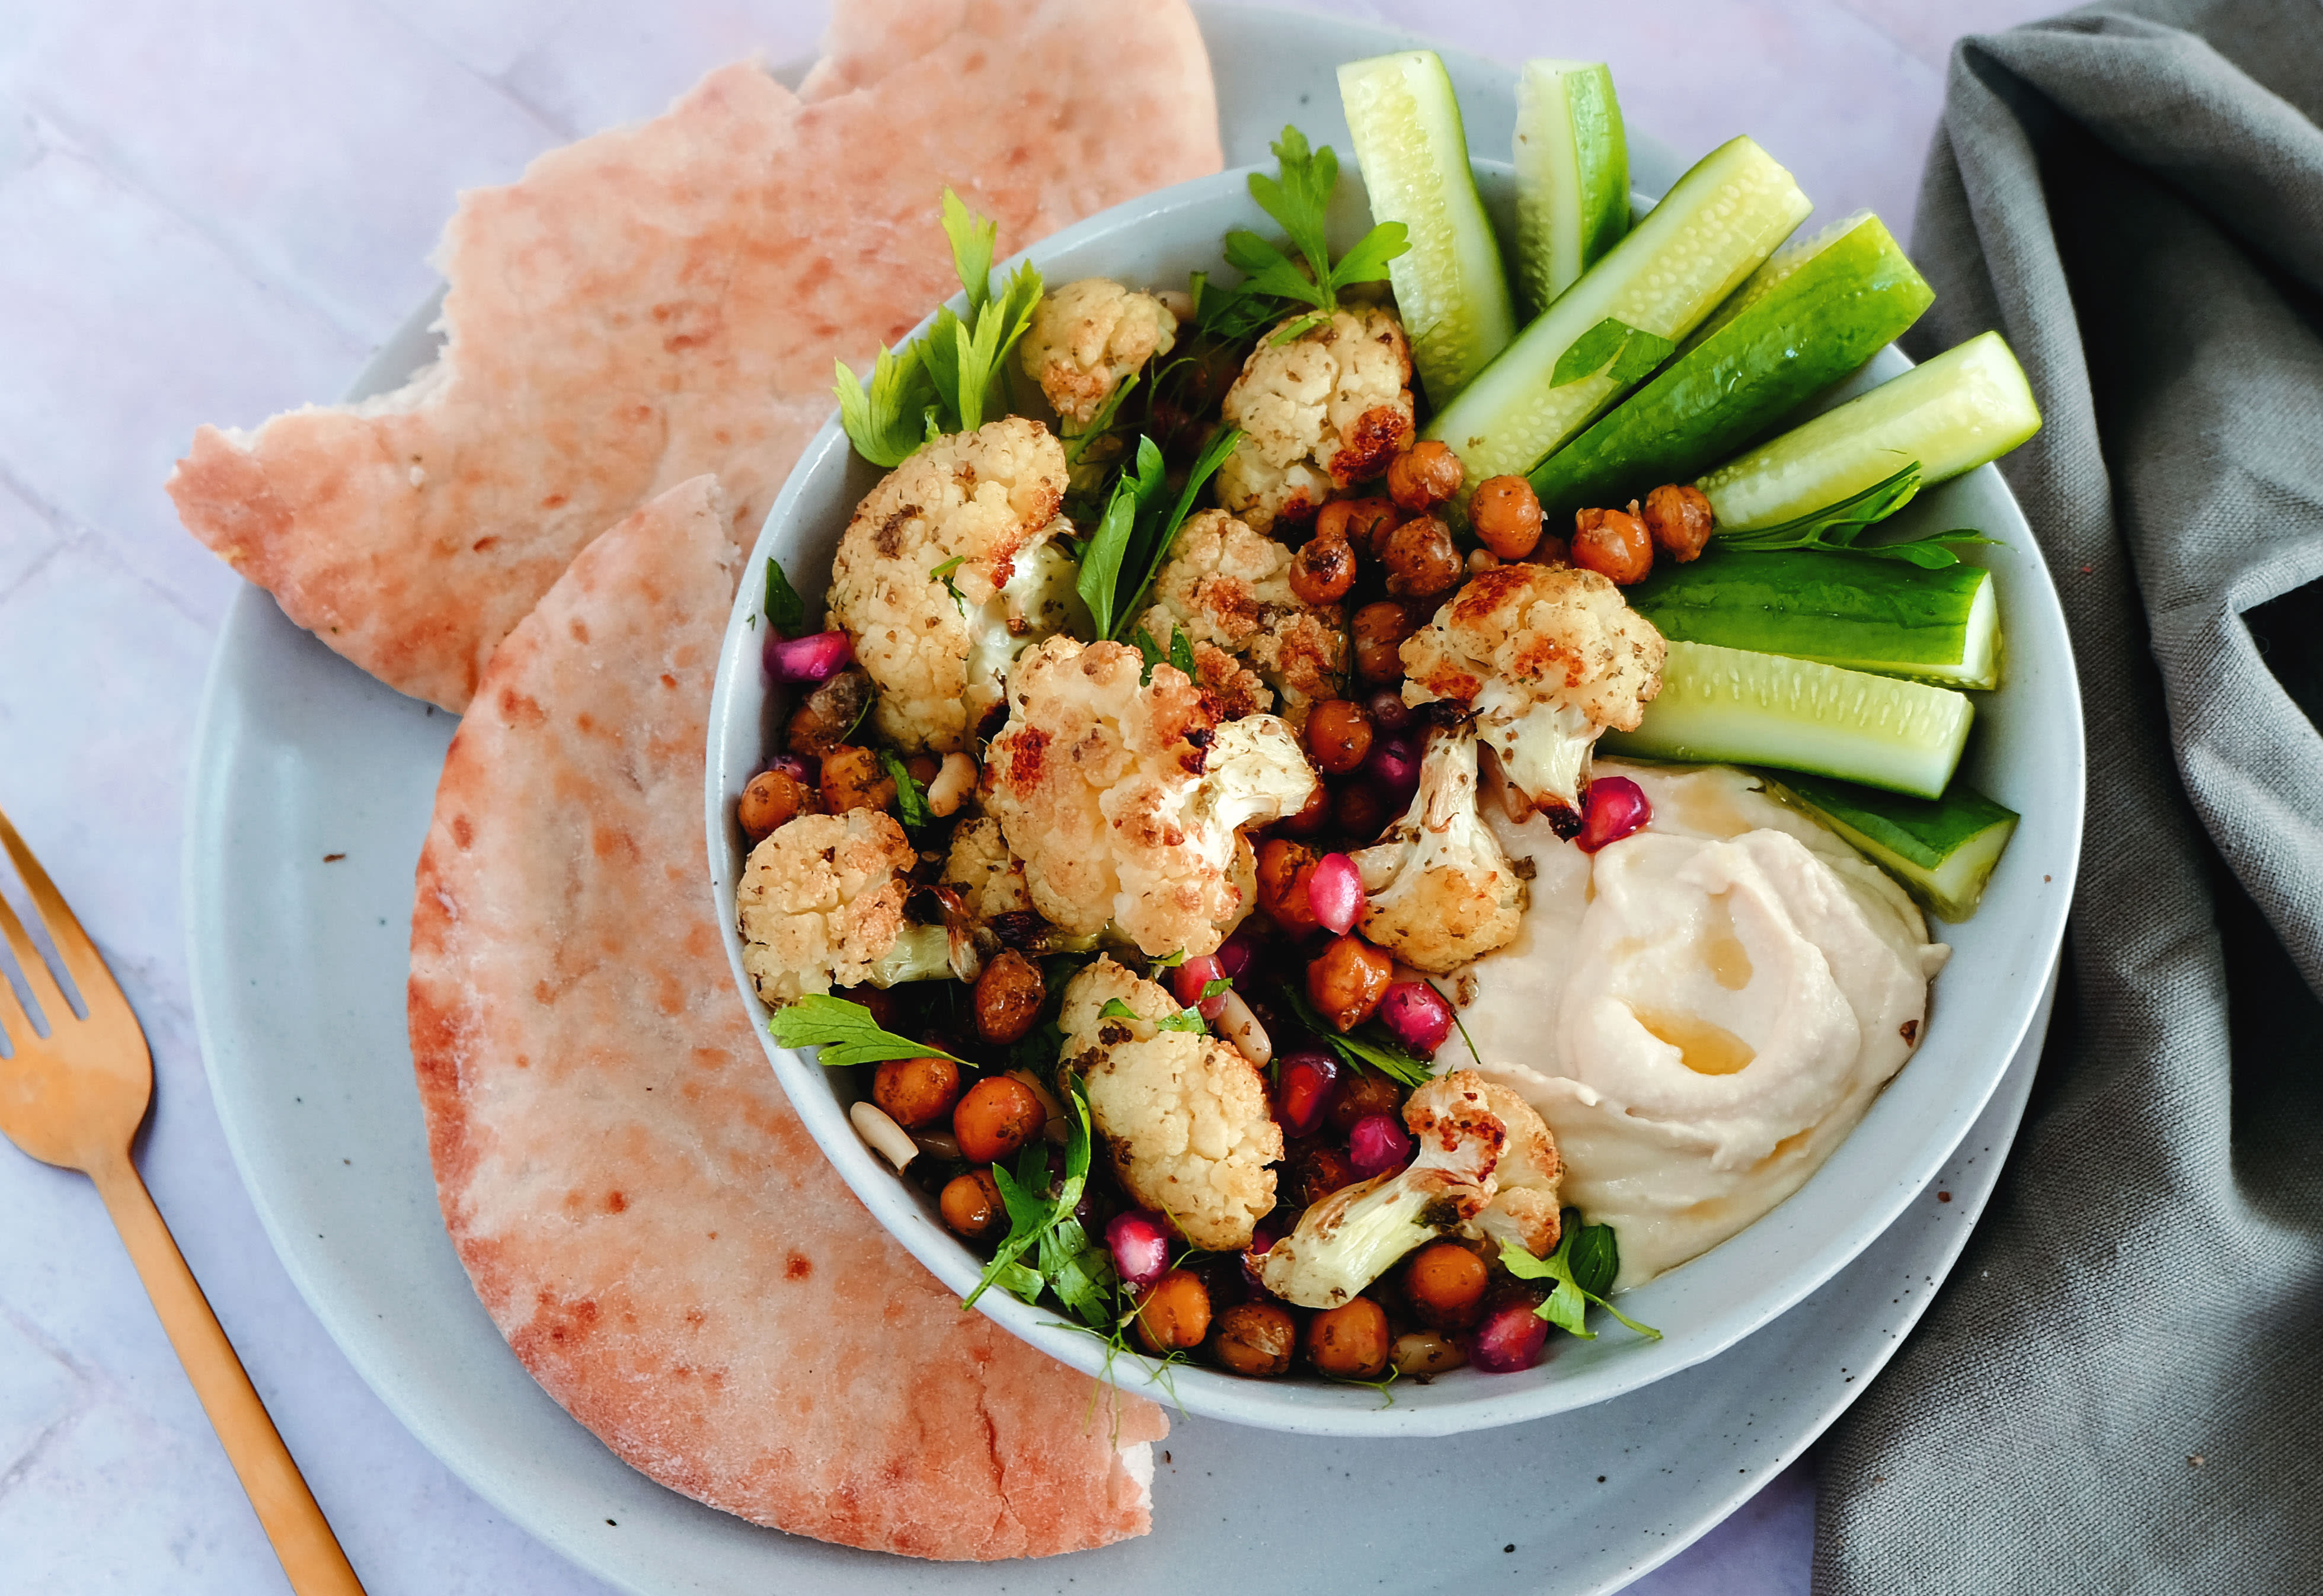 Zaatar Roasted Cauliflower and Chickpeas with Hummus and Pitta